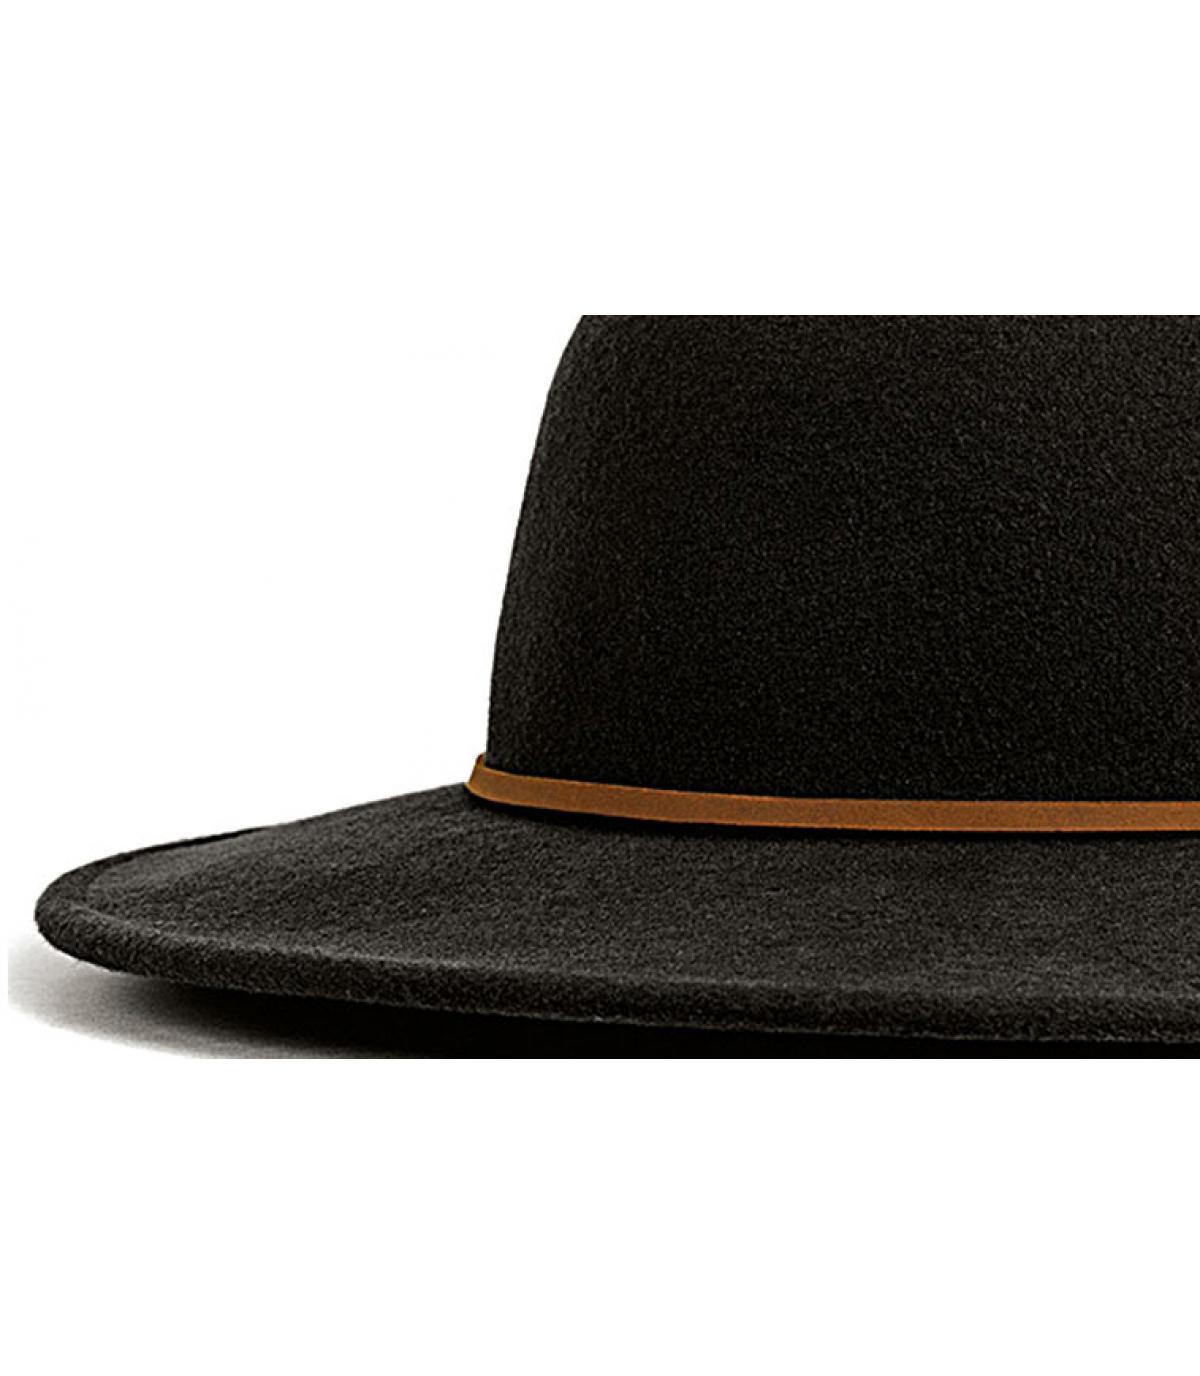 Détails Tiller black women hat - image 2